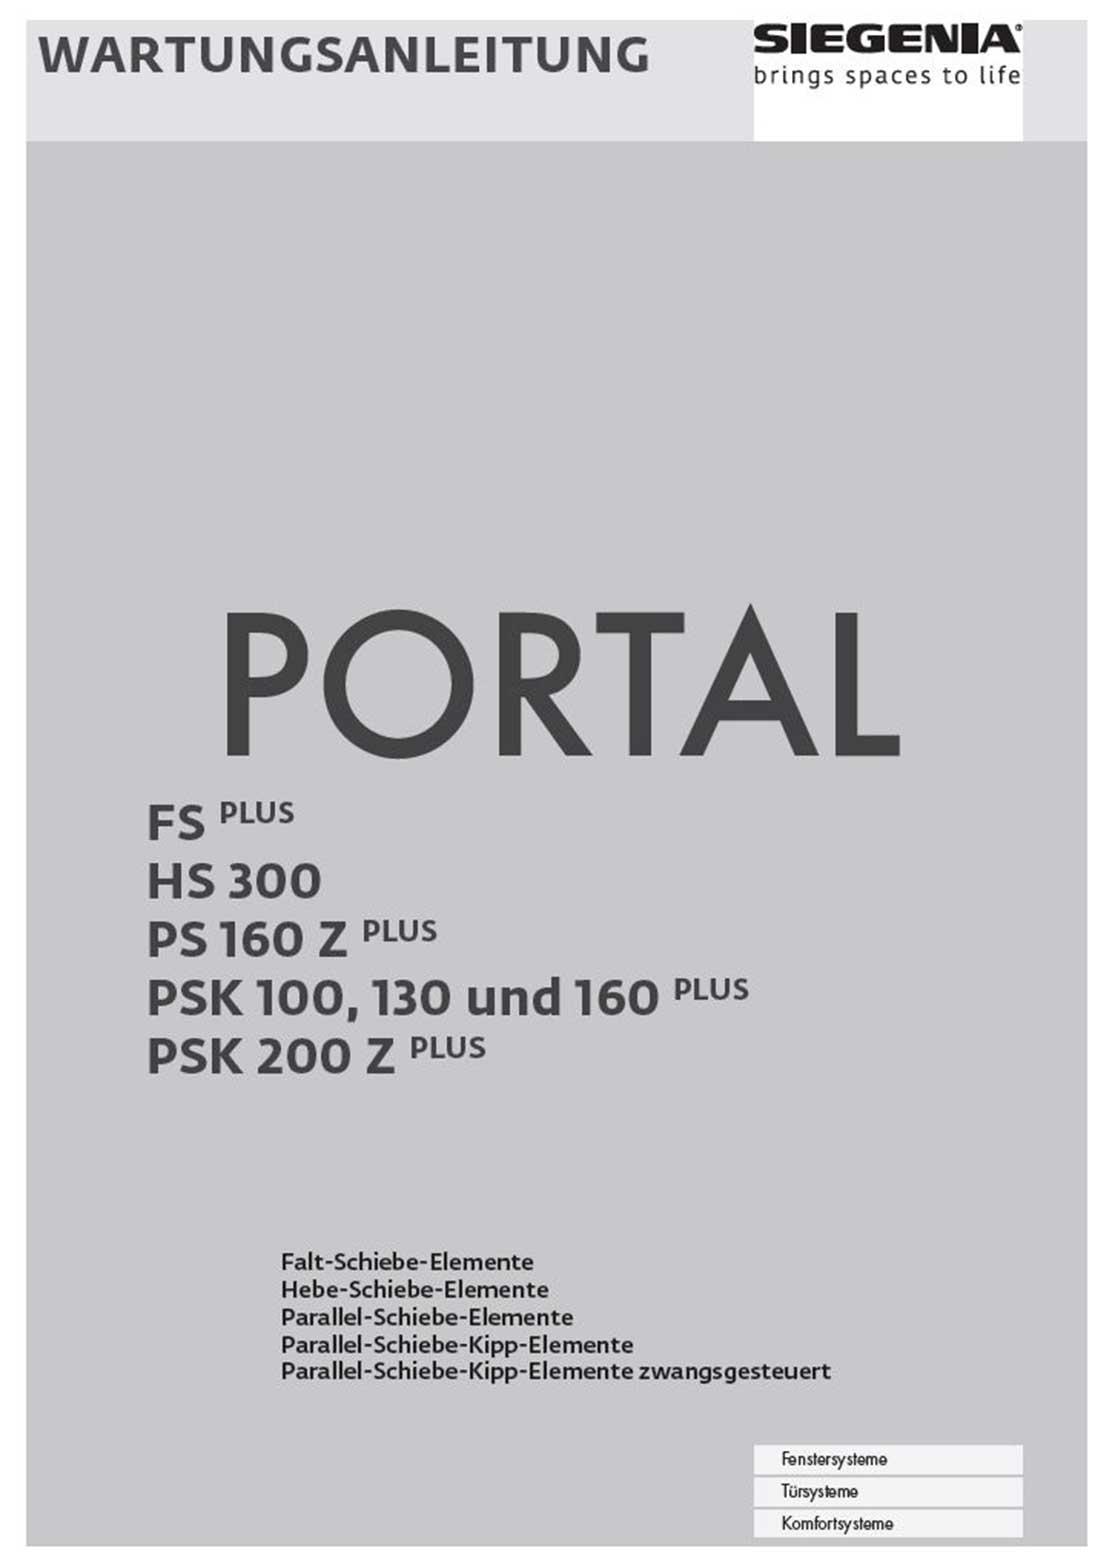 Wartungsanleitung-PORTAL-SIEGENIA-1